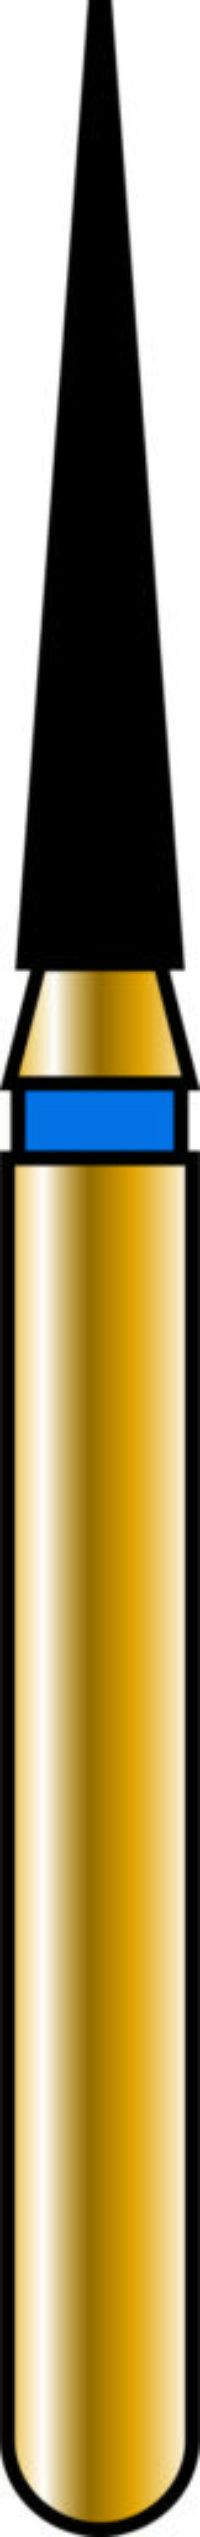 Flame 14-8mm Gold Diamond Bur